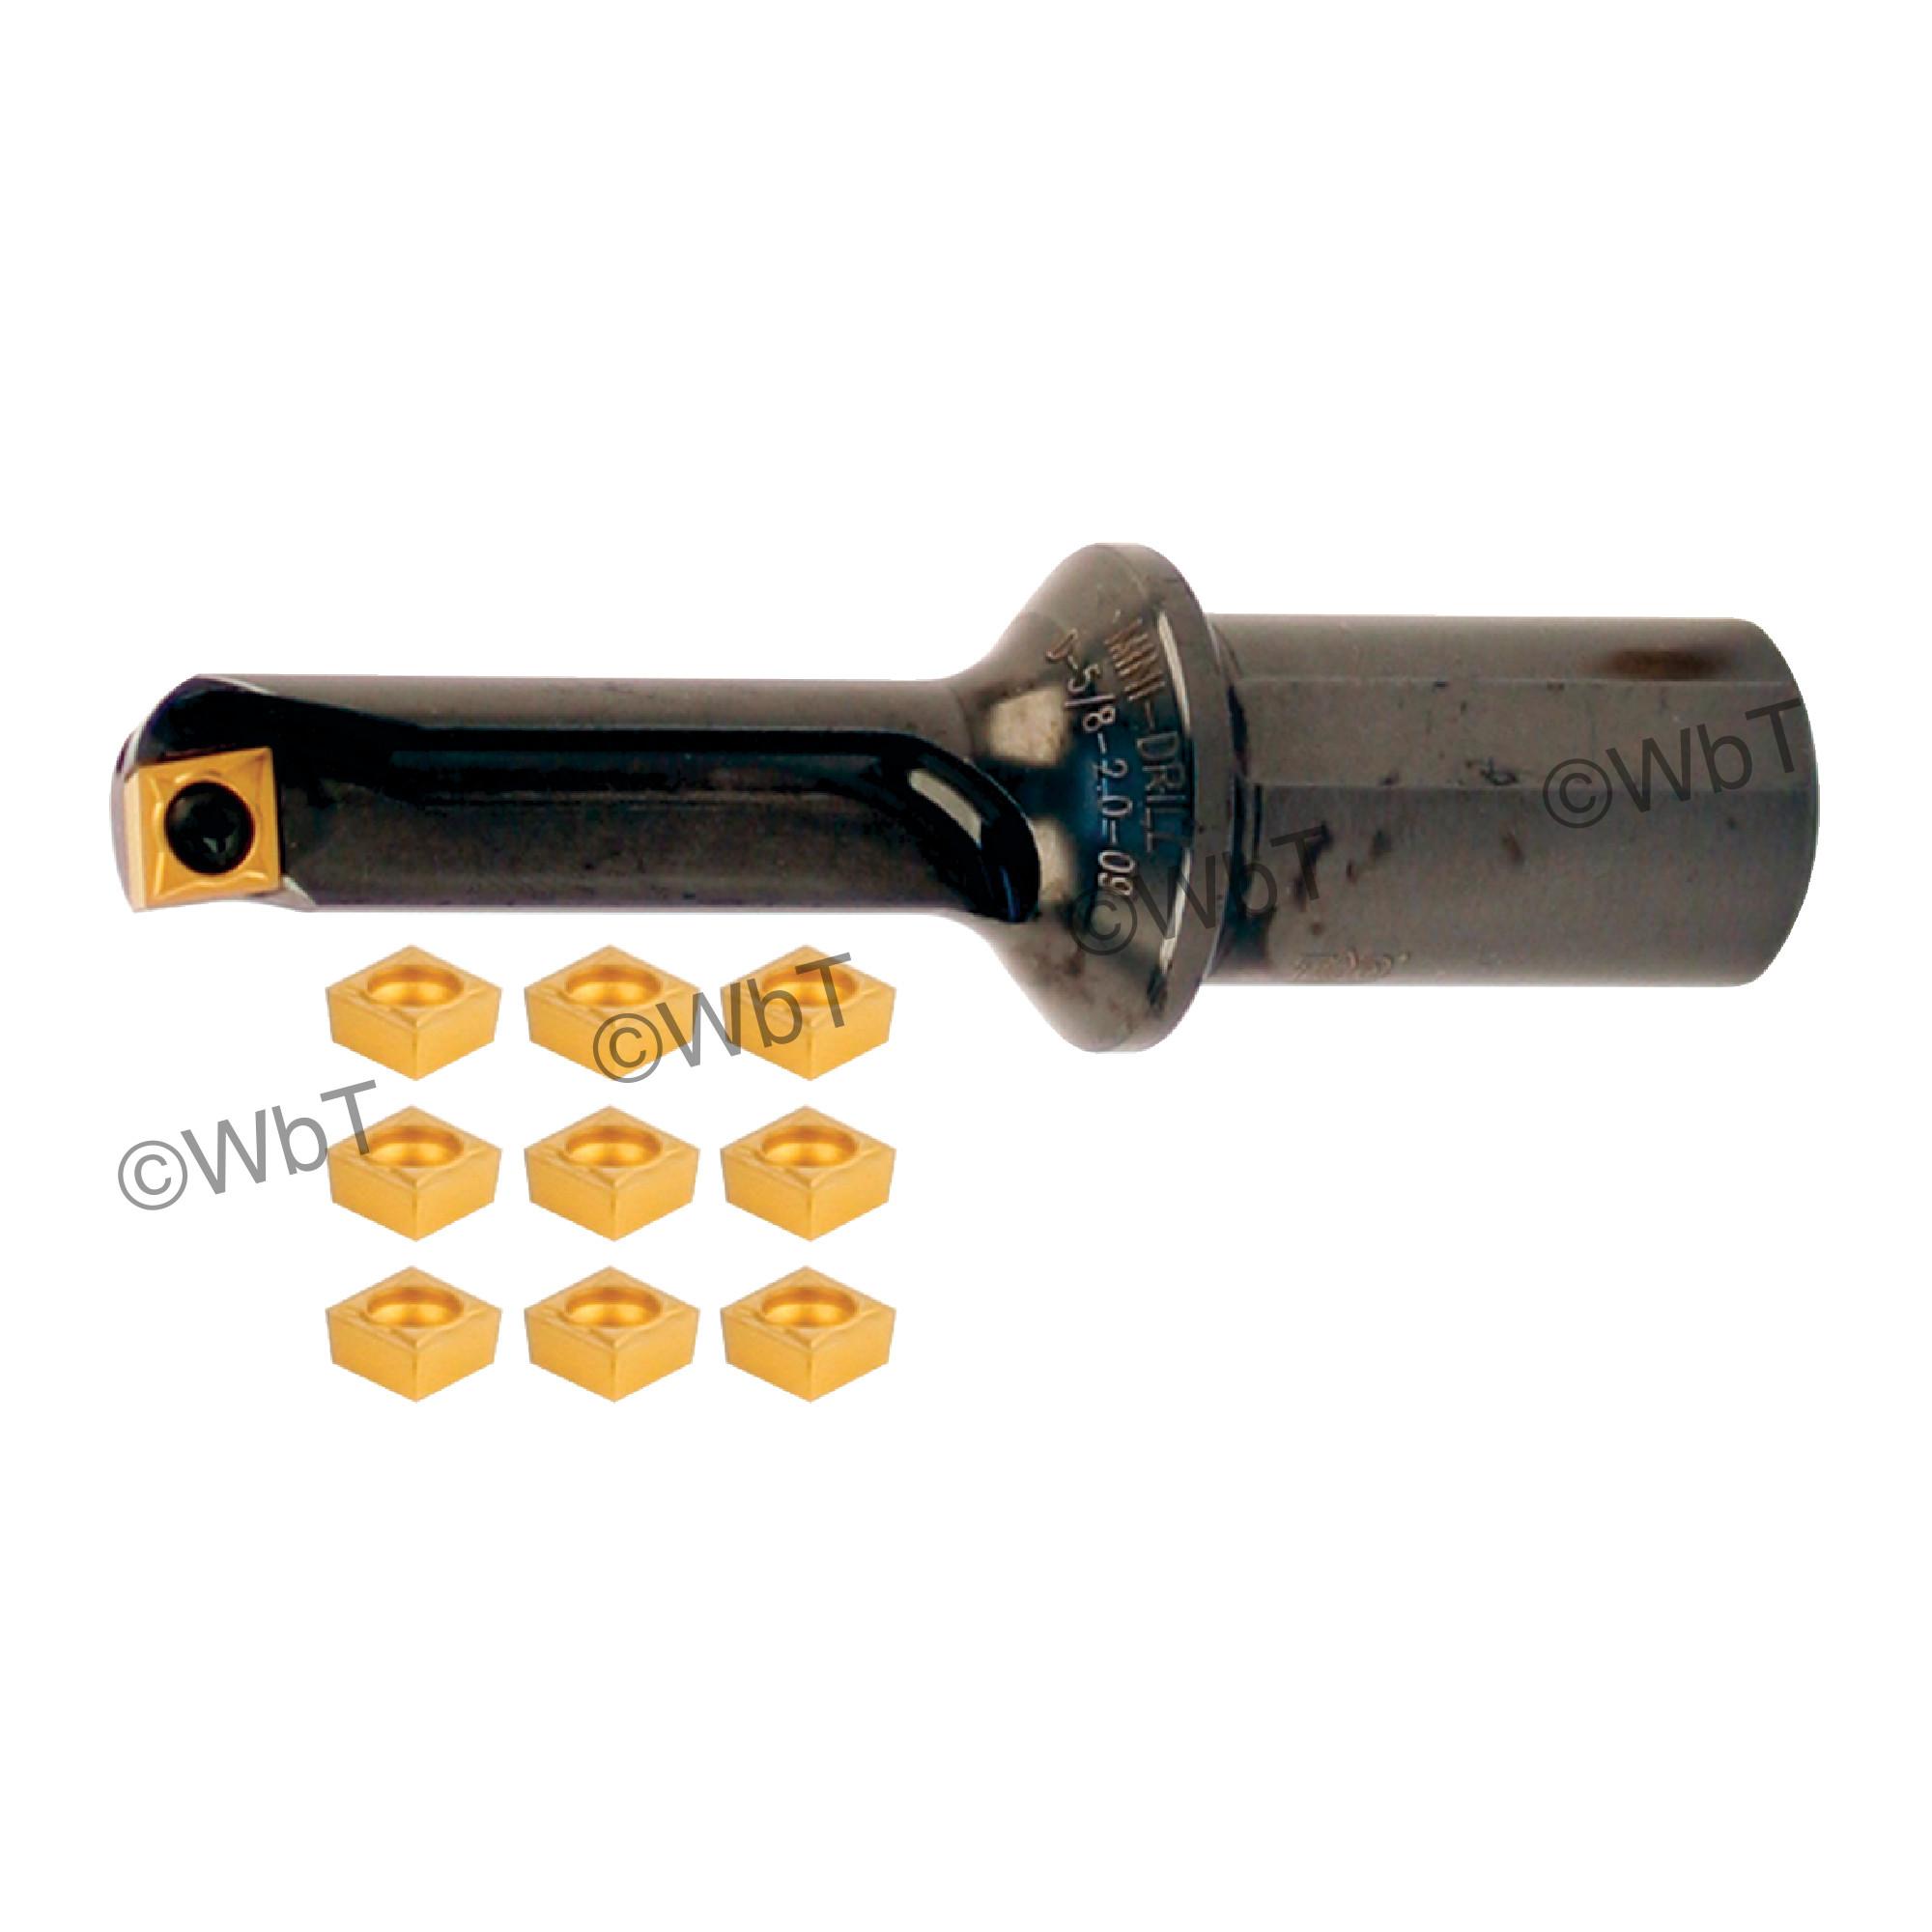 "T&O - D-1/2-1.2-06 SET - Multi Tool Set / (1) 1/2"" MULTI-TOOL (1/2""ø) & (10) CCMT2(1.5)1 Coated Inserts / 1.200"""